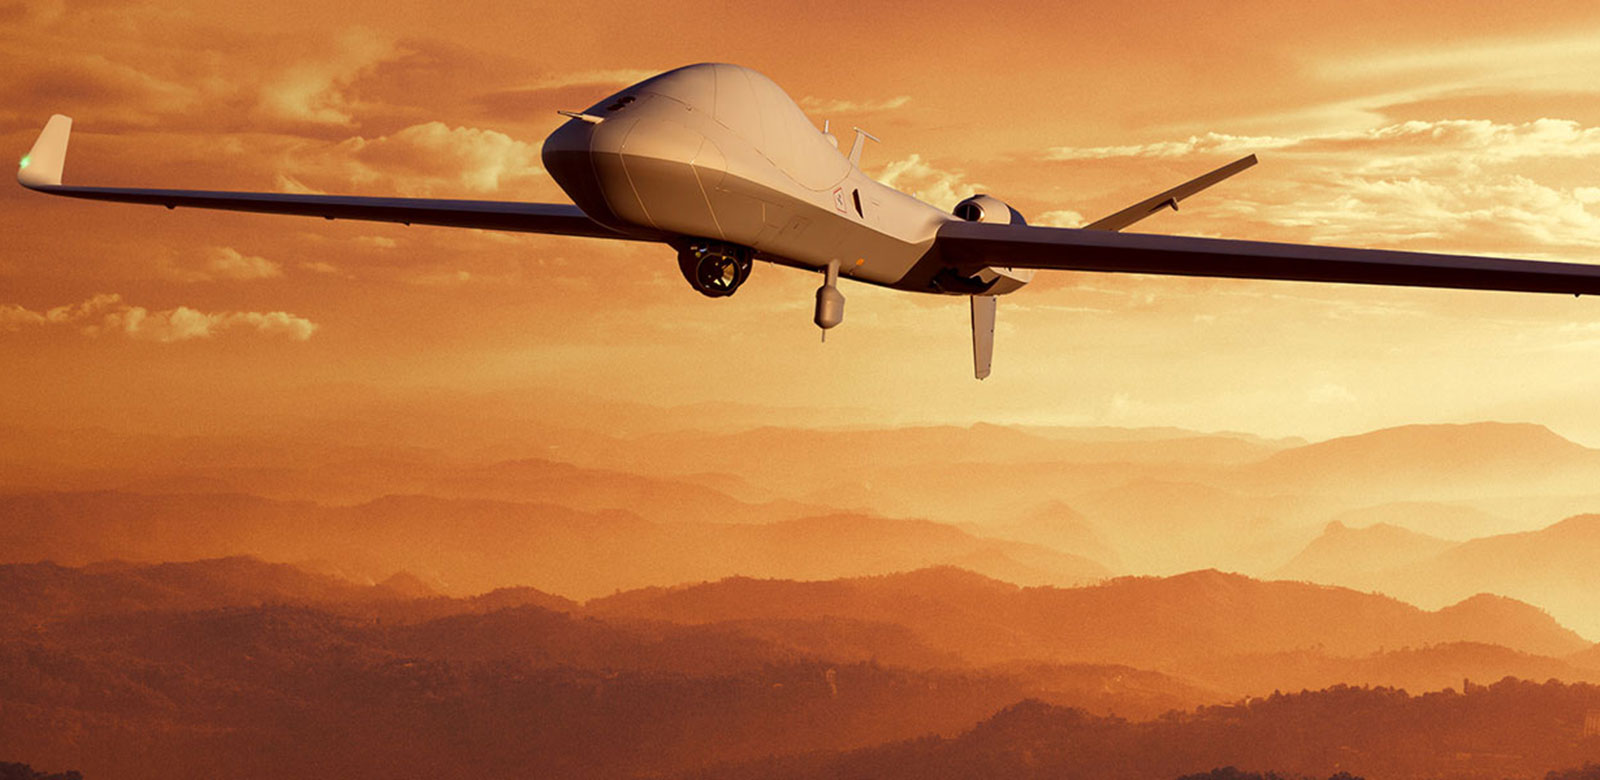 MQ-9B SkyGuardian / SeaGuardian | General Atomics Aeronautical Systems Inc.